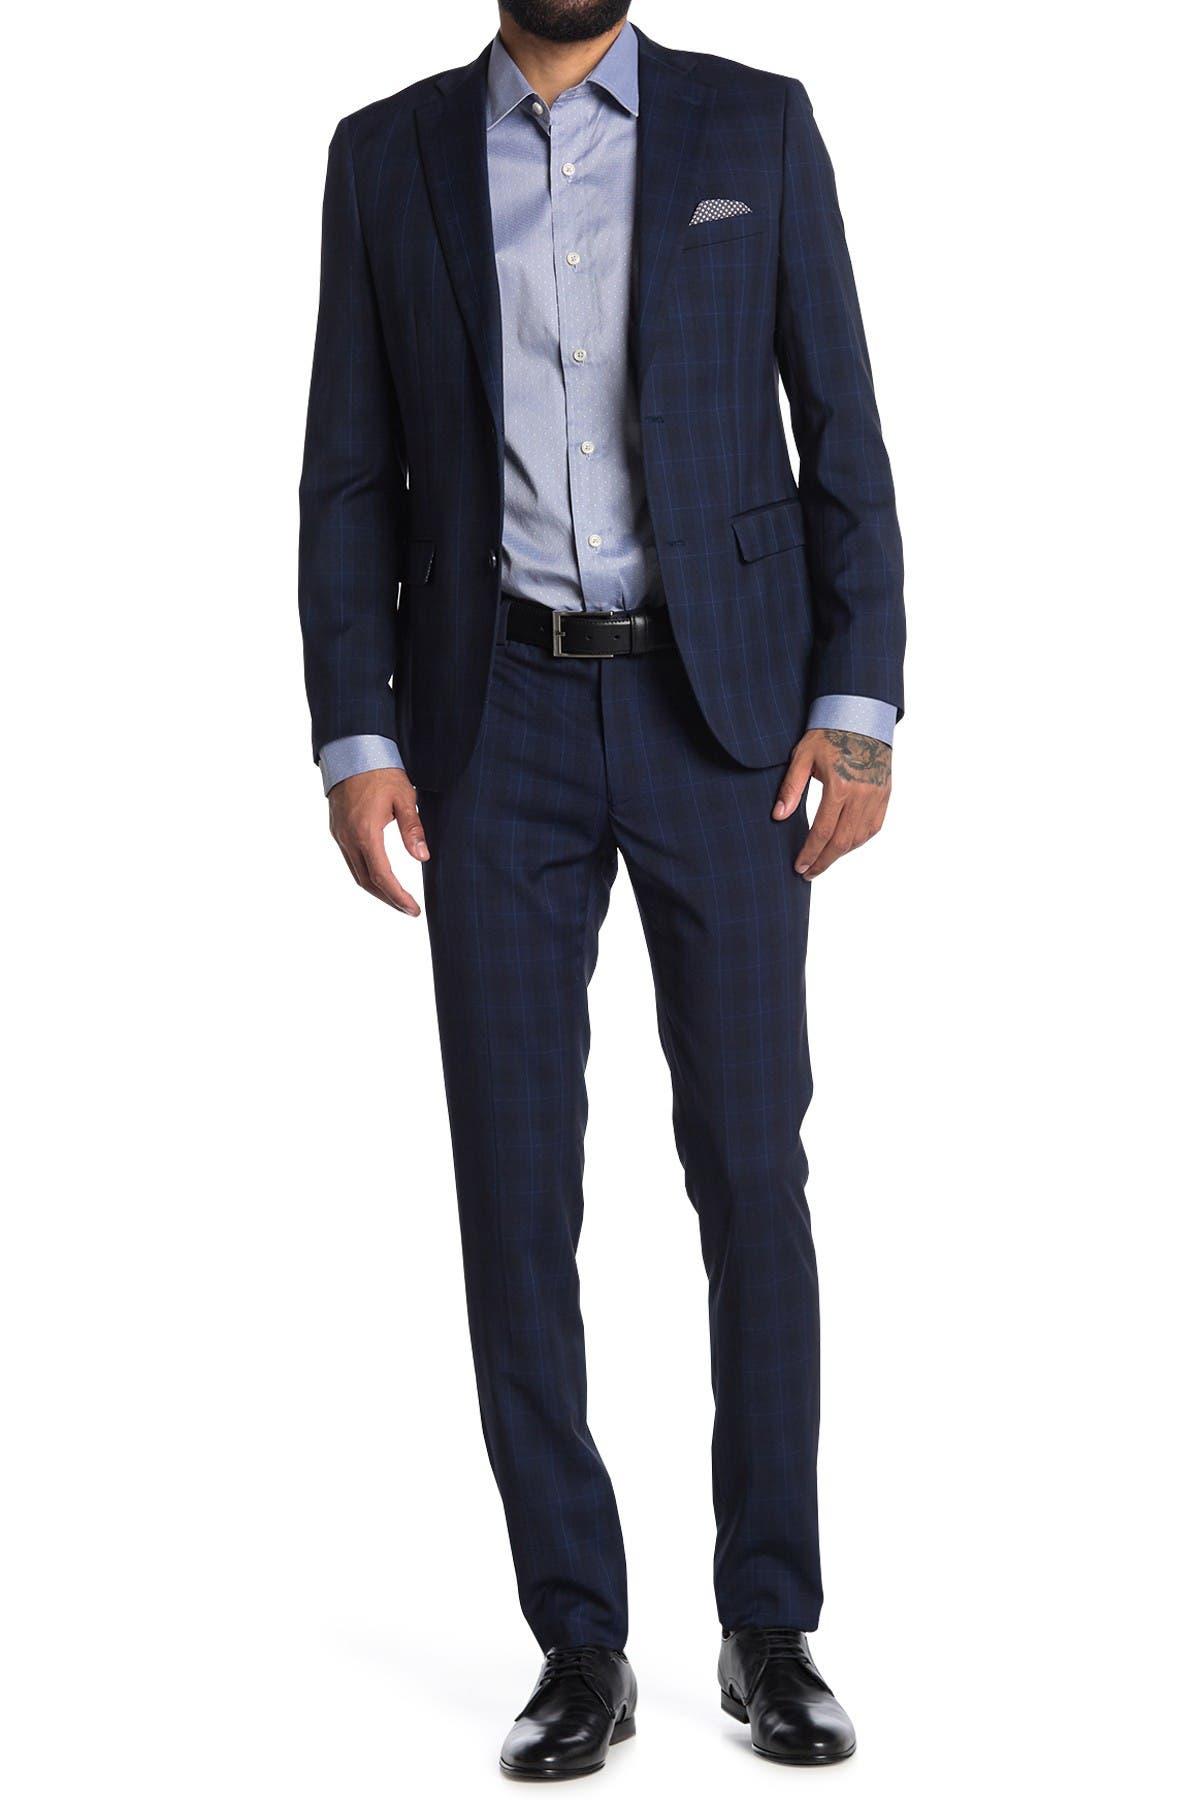 Image of SOUL OF LONDON Navy Windowpane Plaid Two Button Notch Lapel Slim Fit Suit